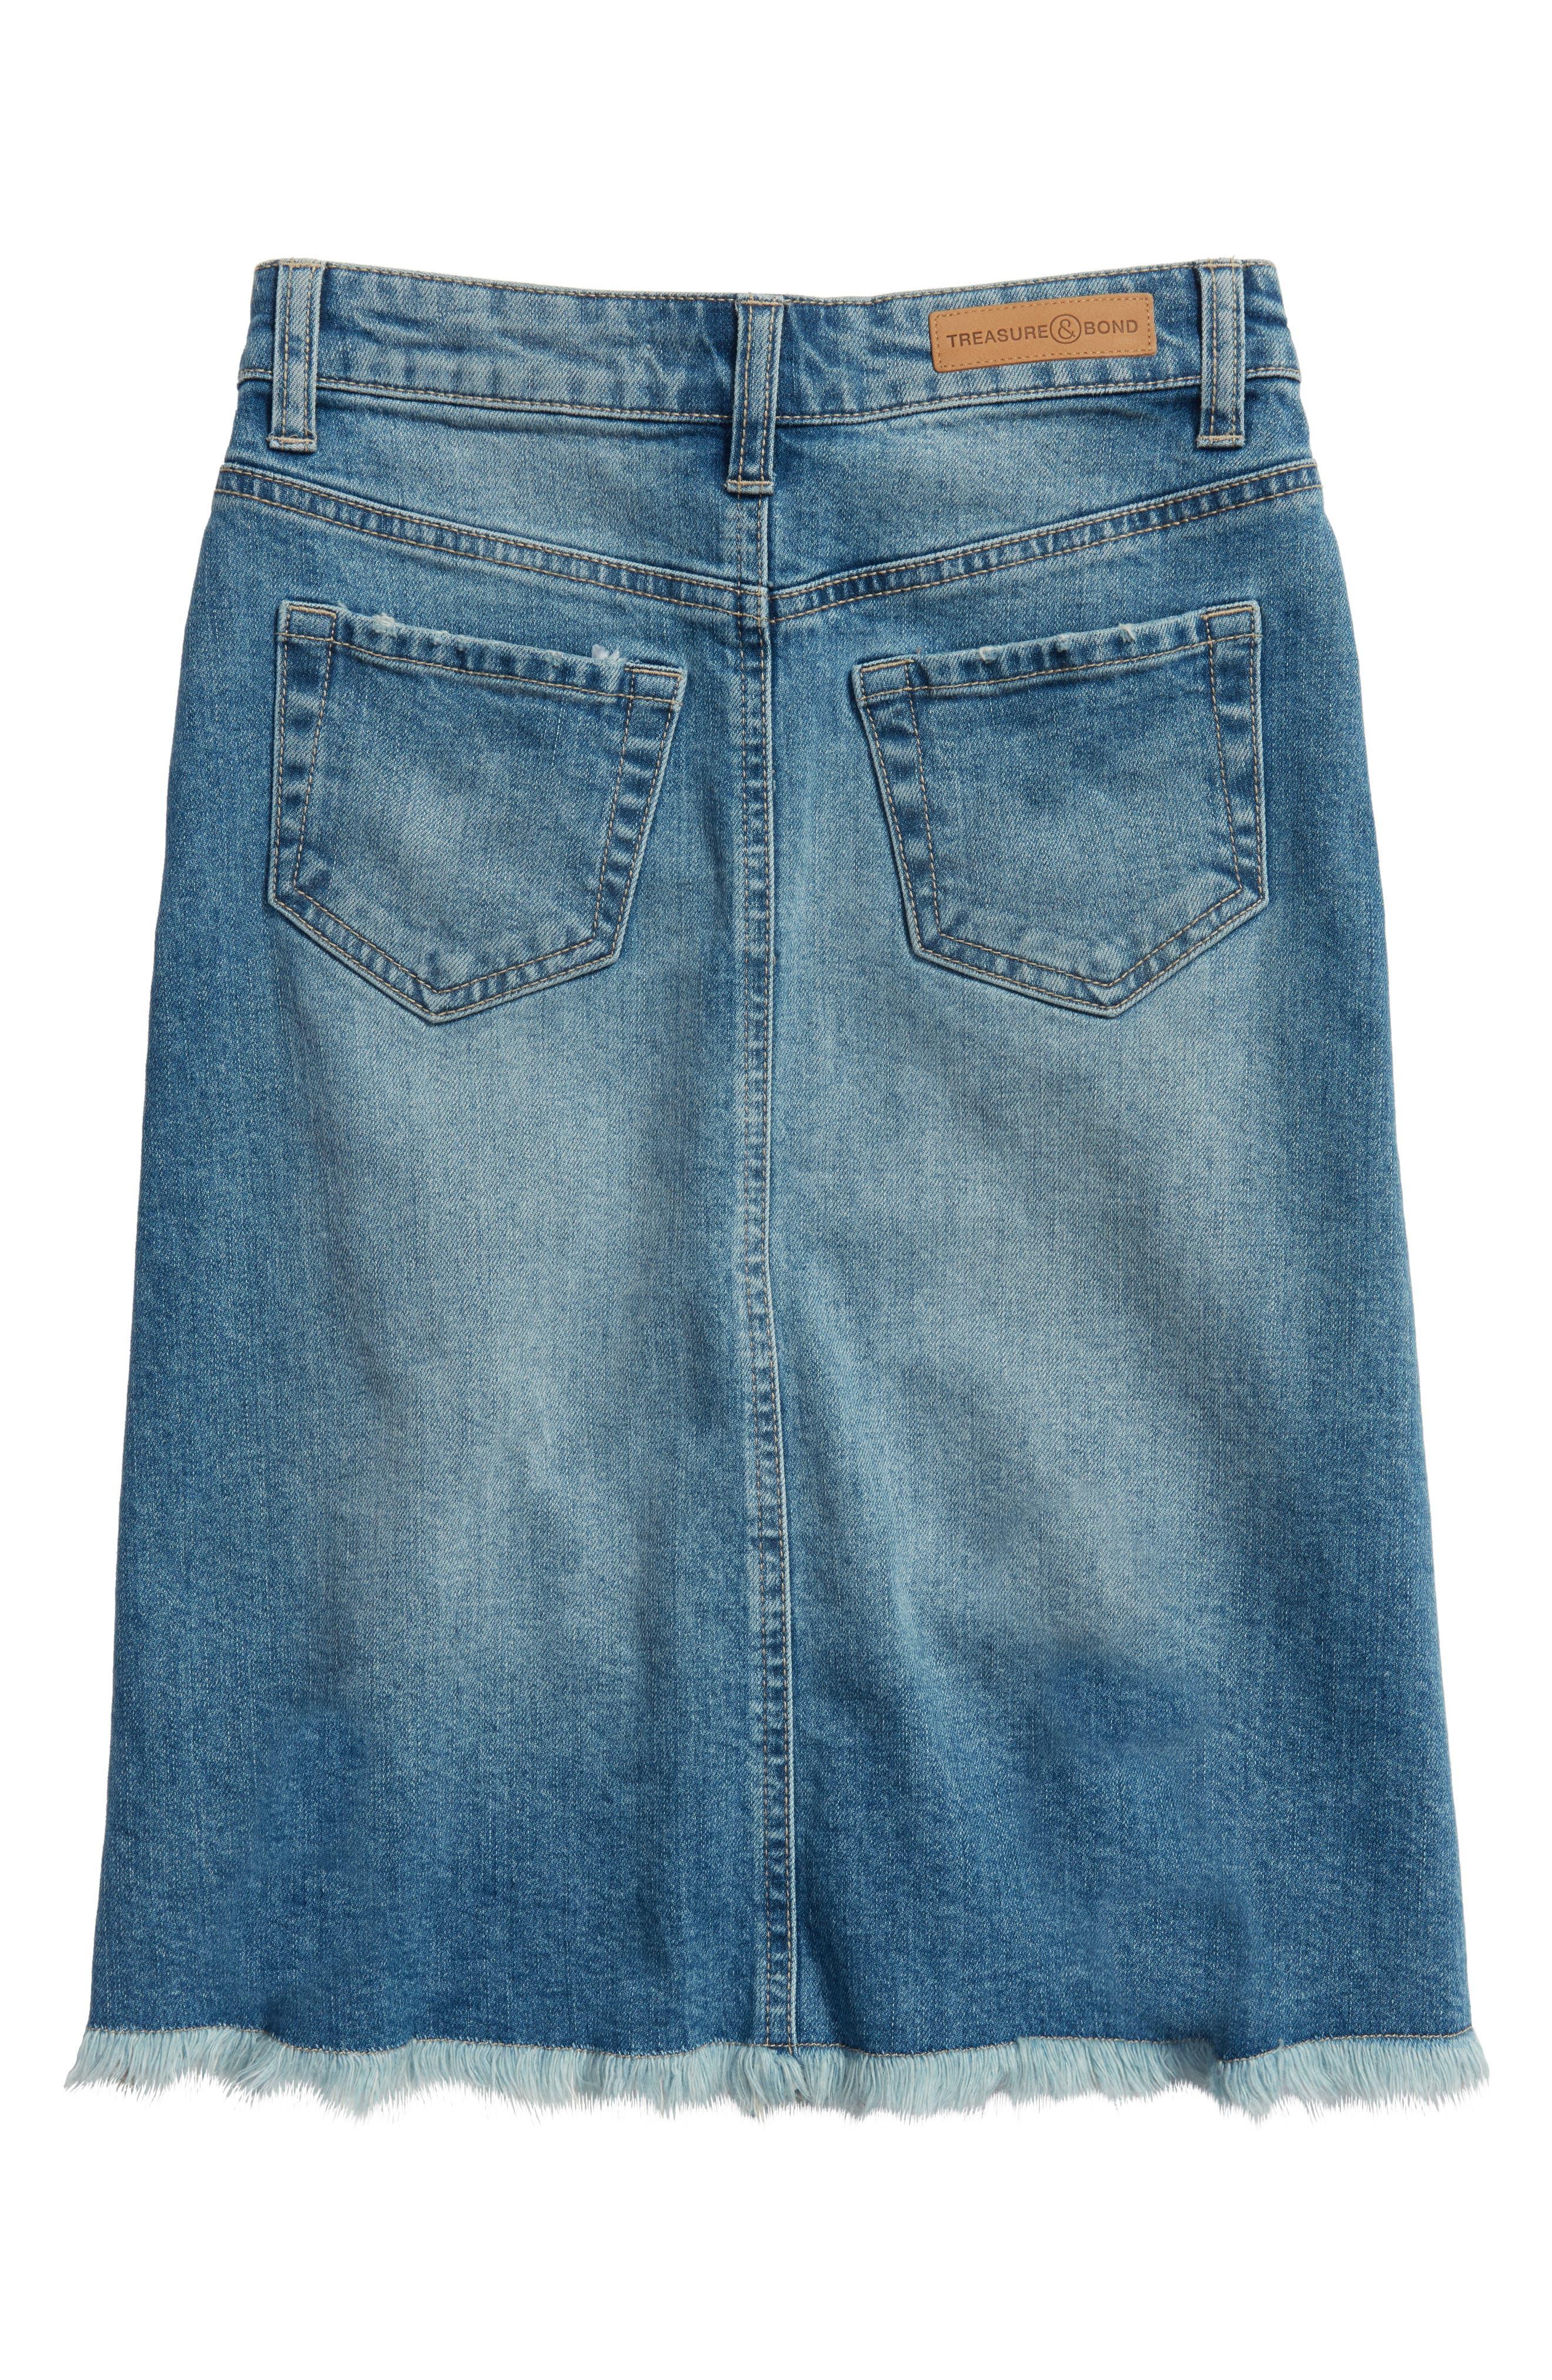 Step Hem Denim Skirt,                             Alternate thumbnail 2, color,                             HIDEAWAY WASH